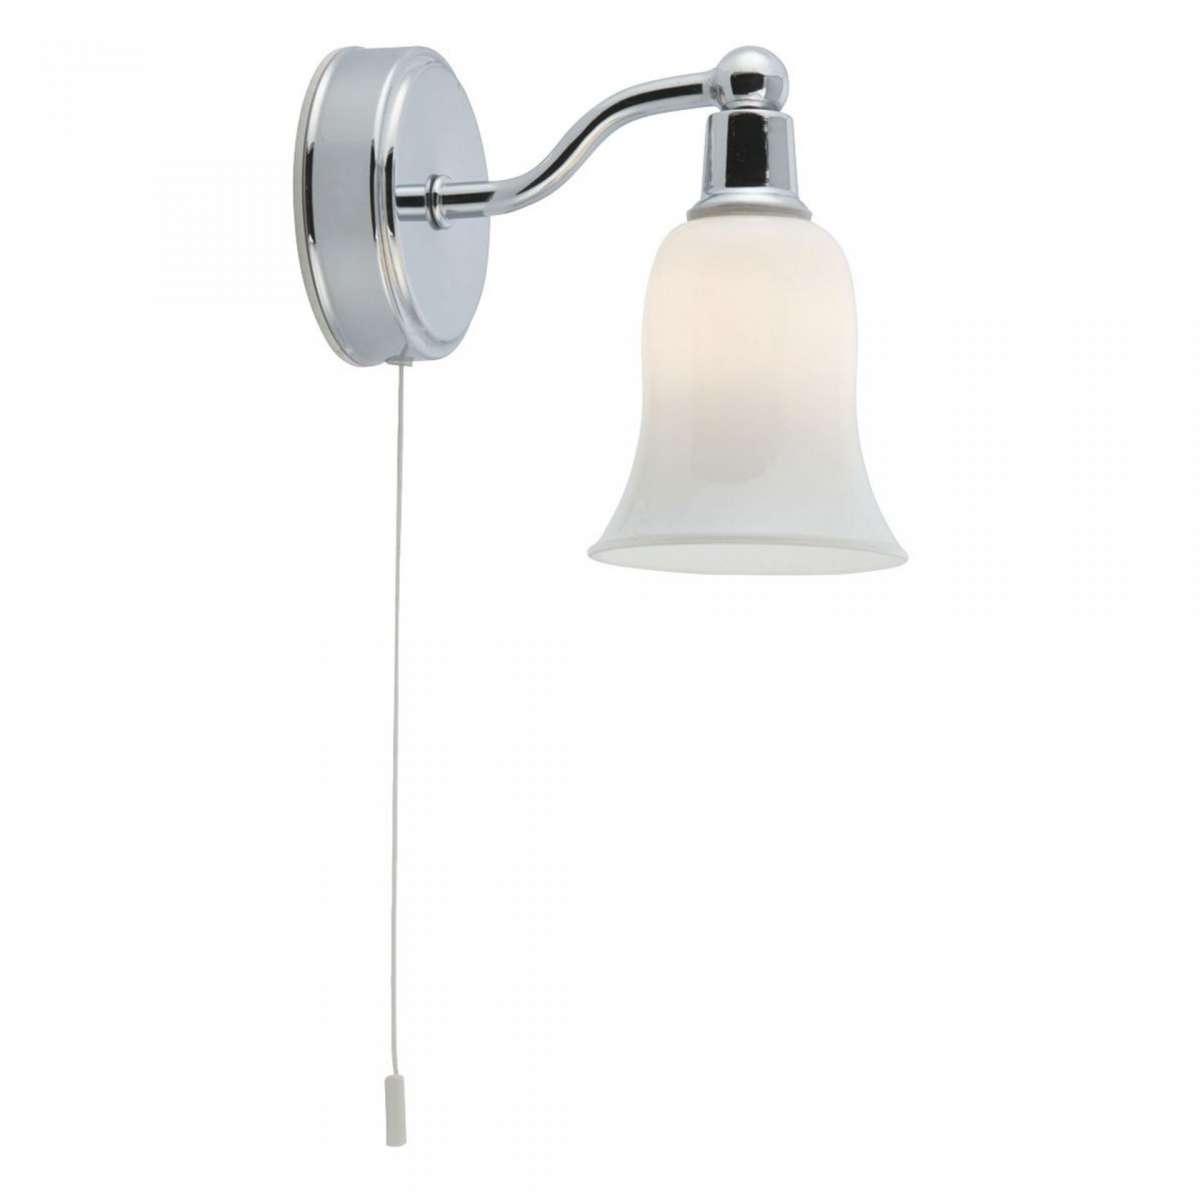 Belvue Bathroom Wall Light IP44 LED White Shade